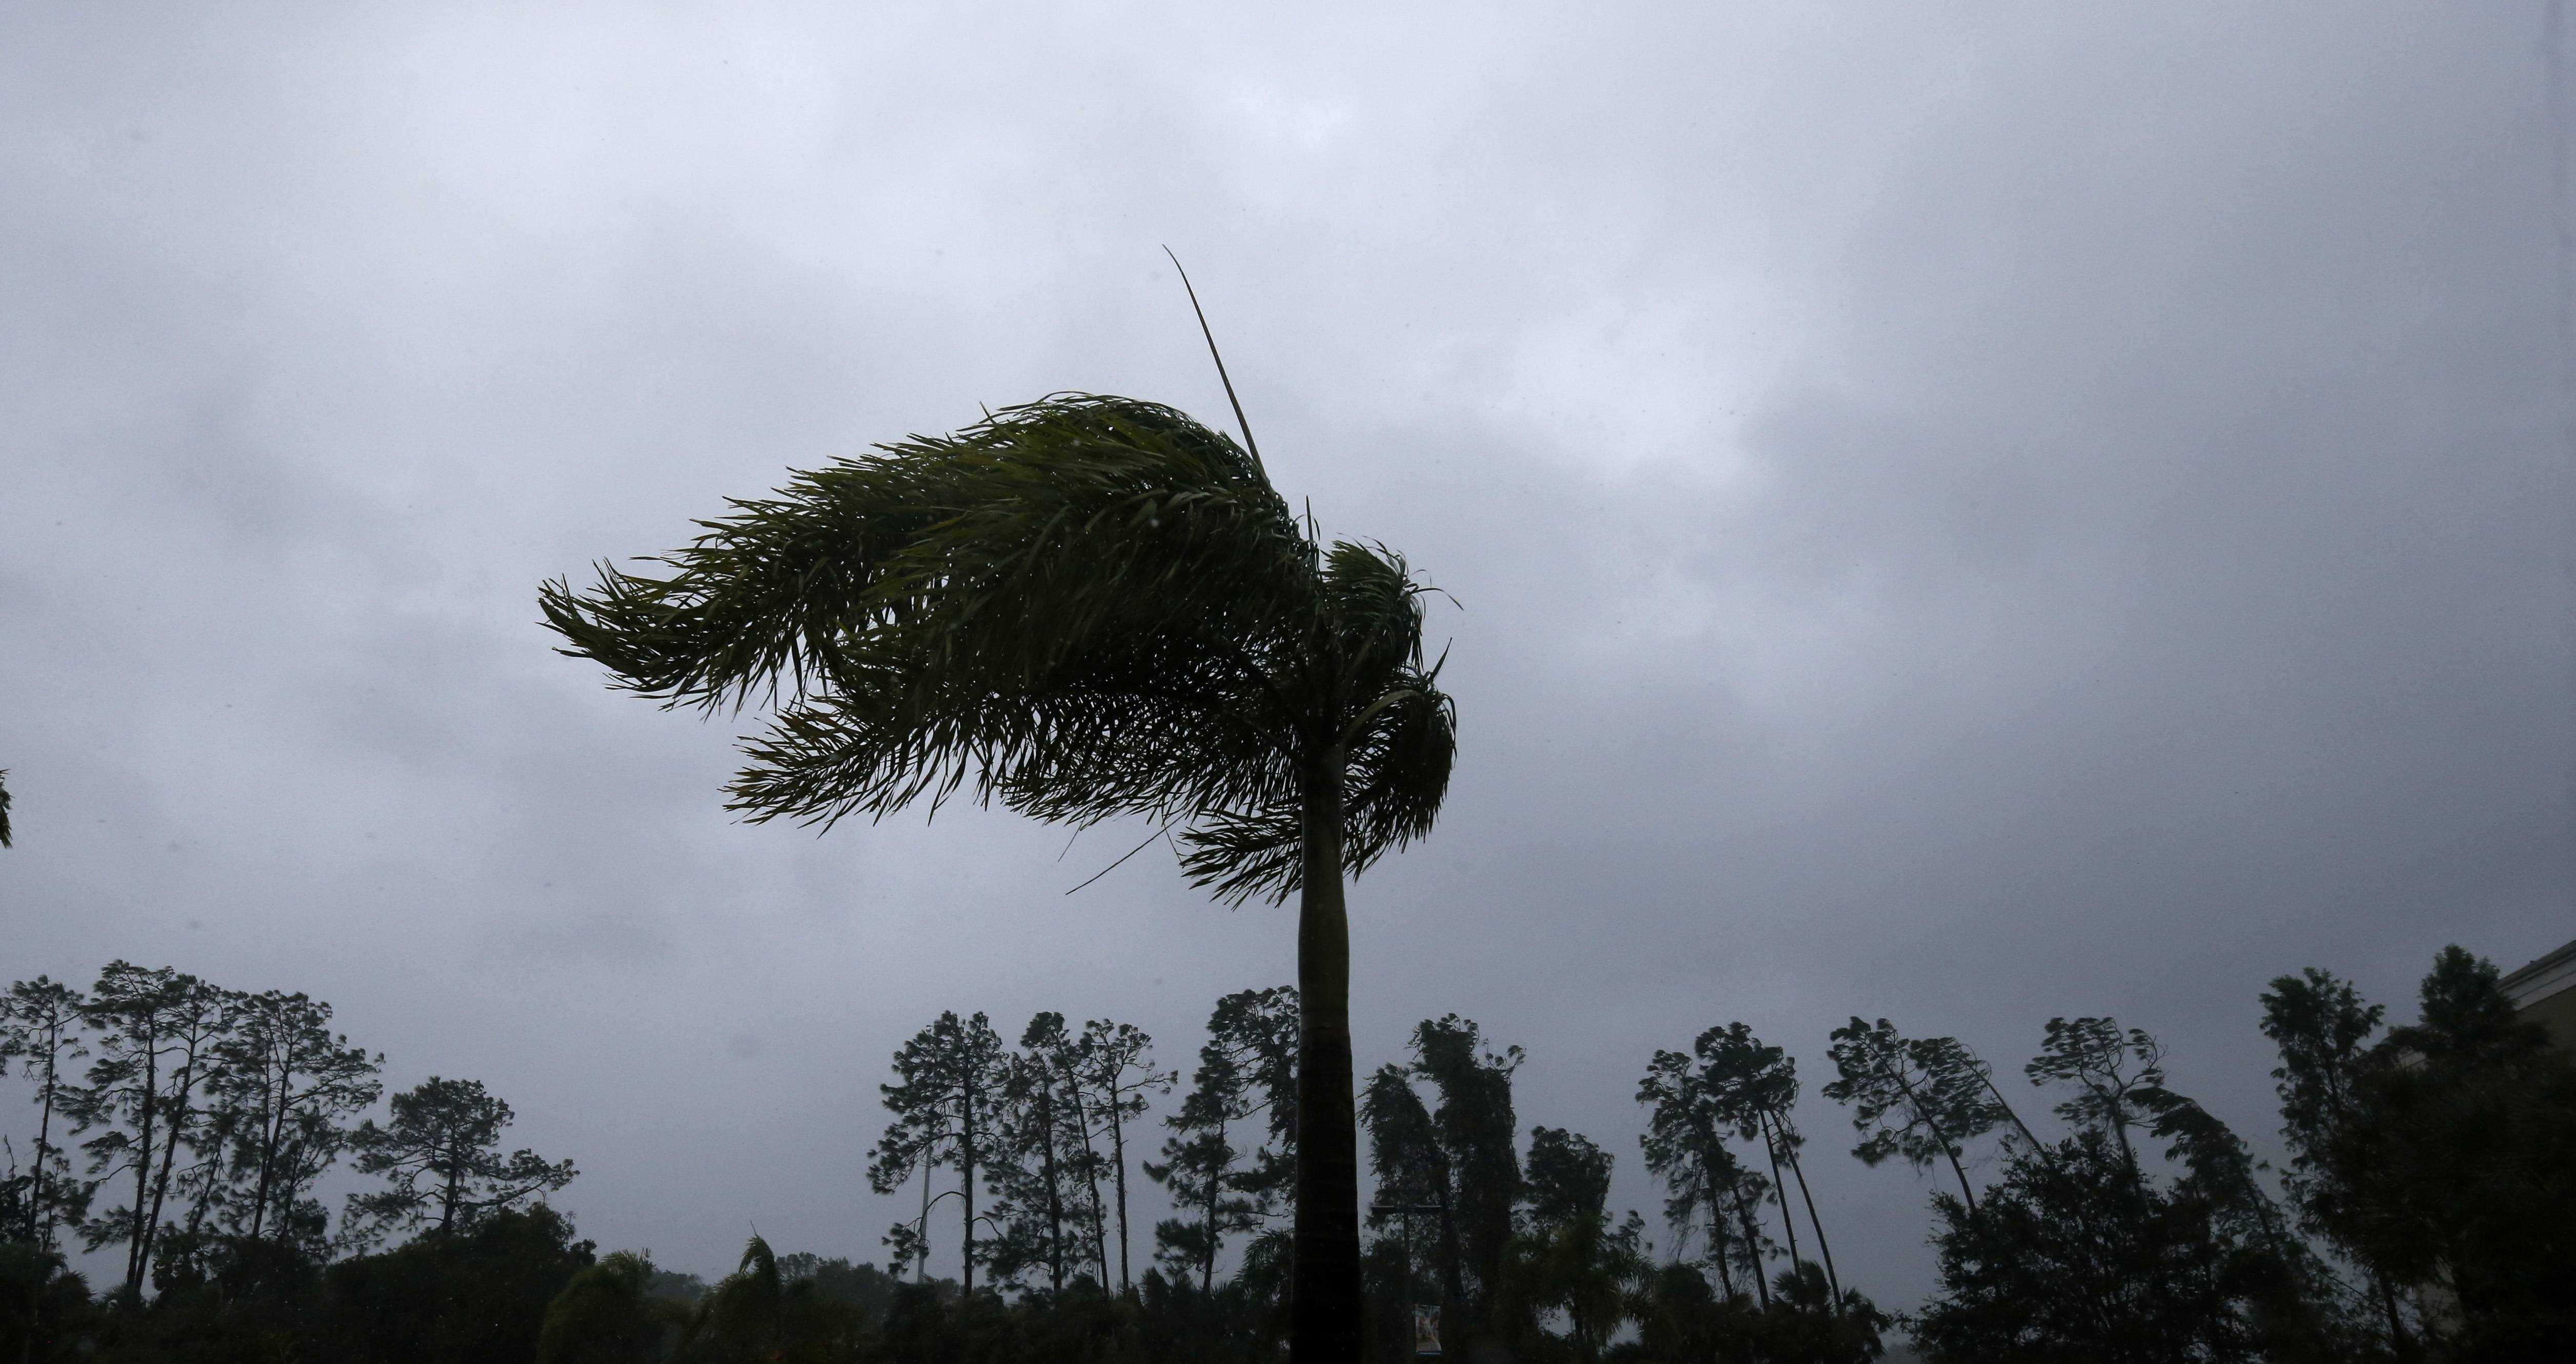 hurricaneirmapuer1-ec014eb62de0559afeb0cd826ae78358.jpg